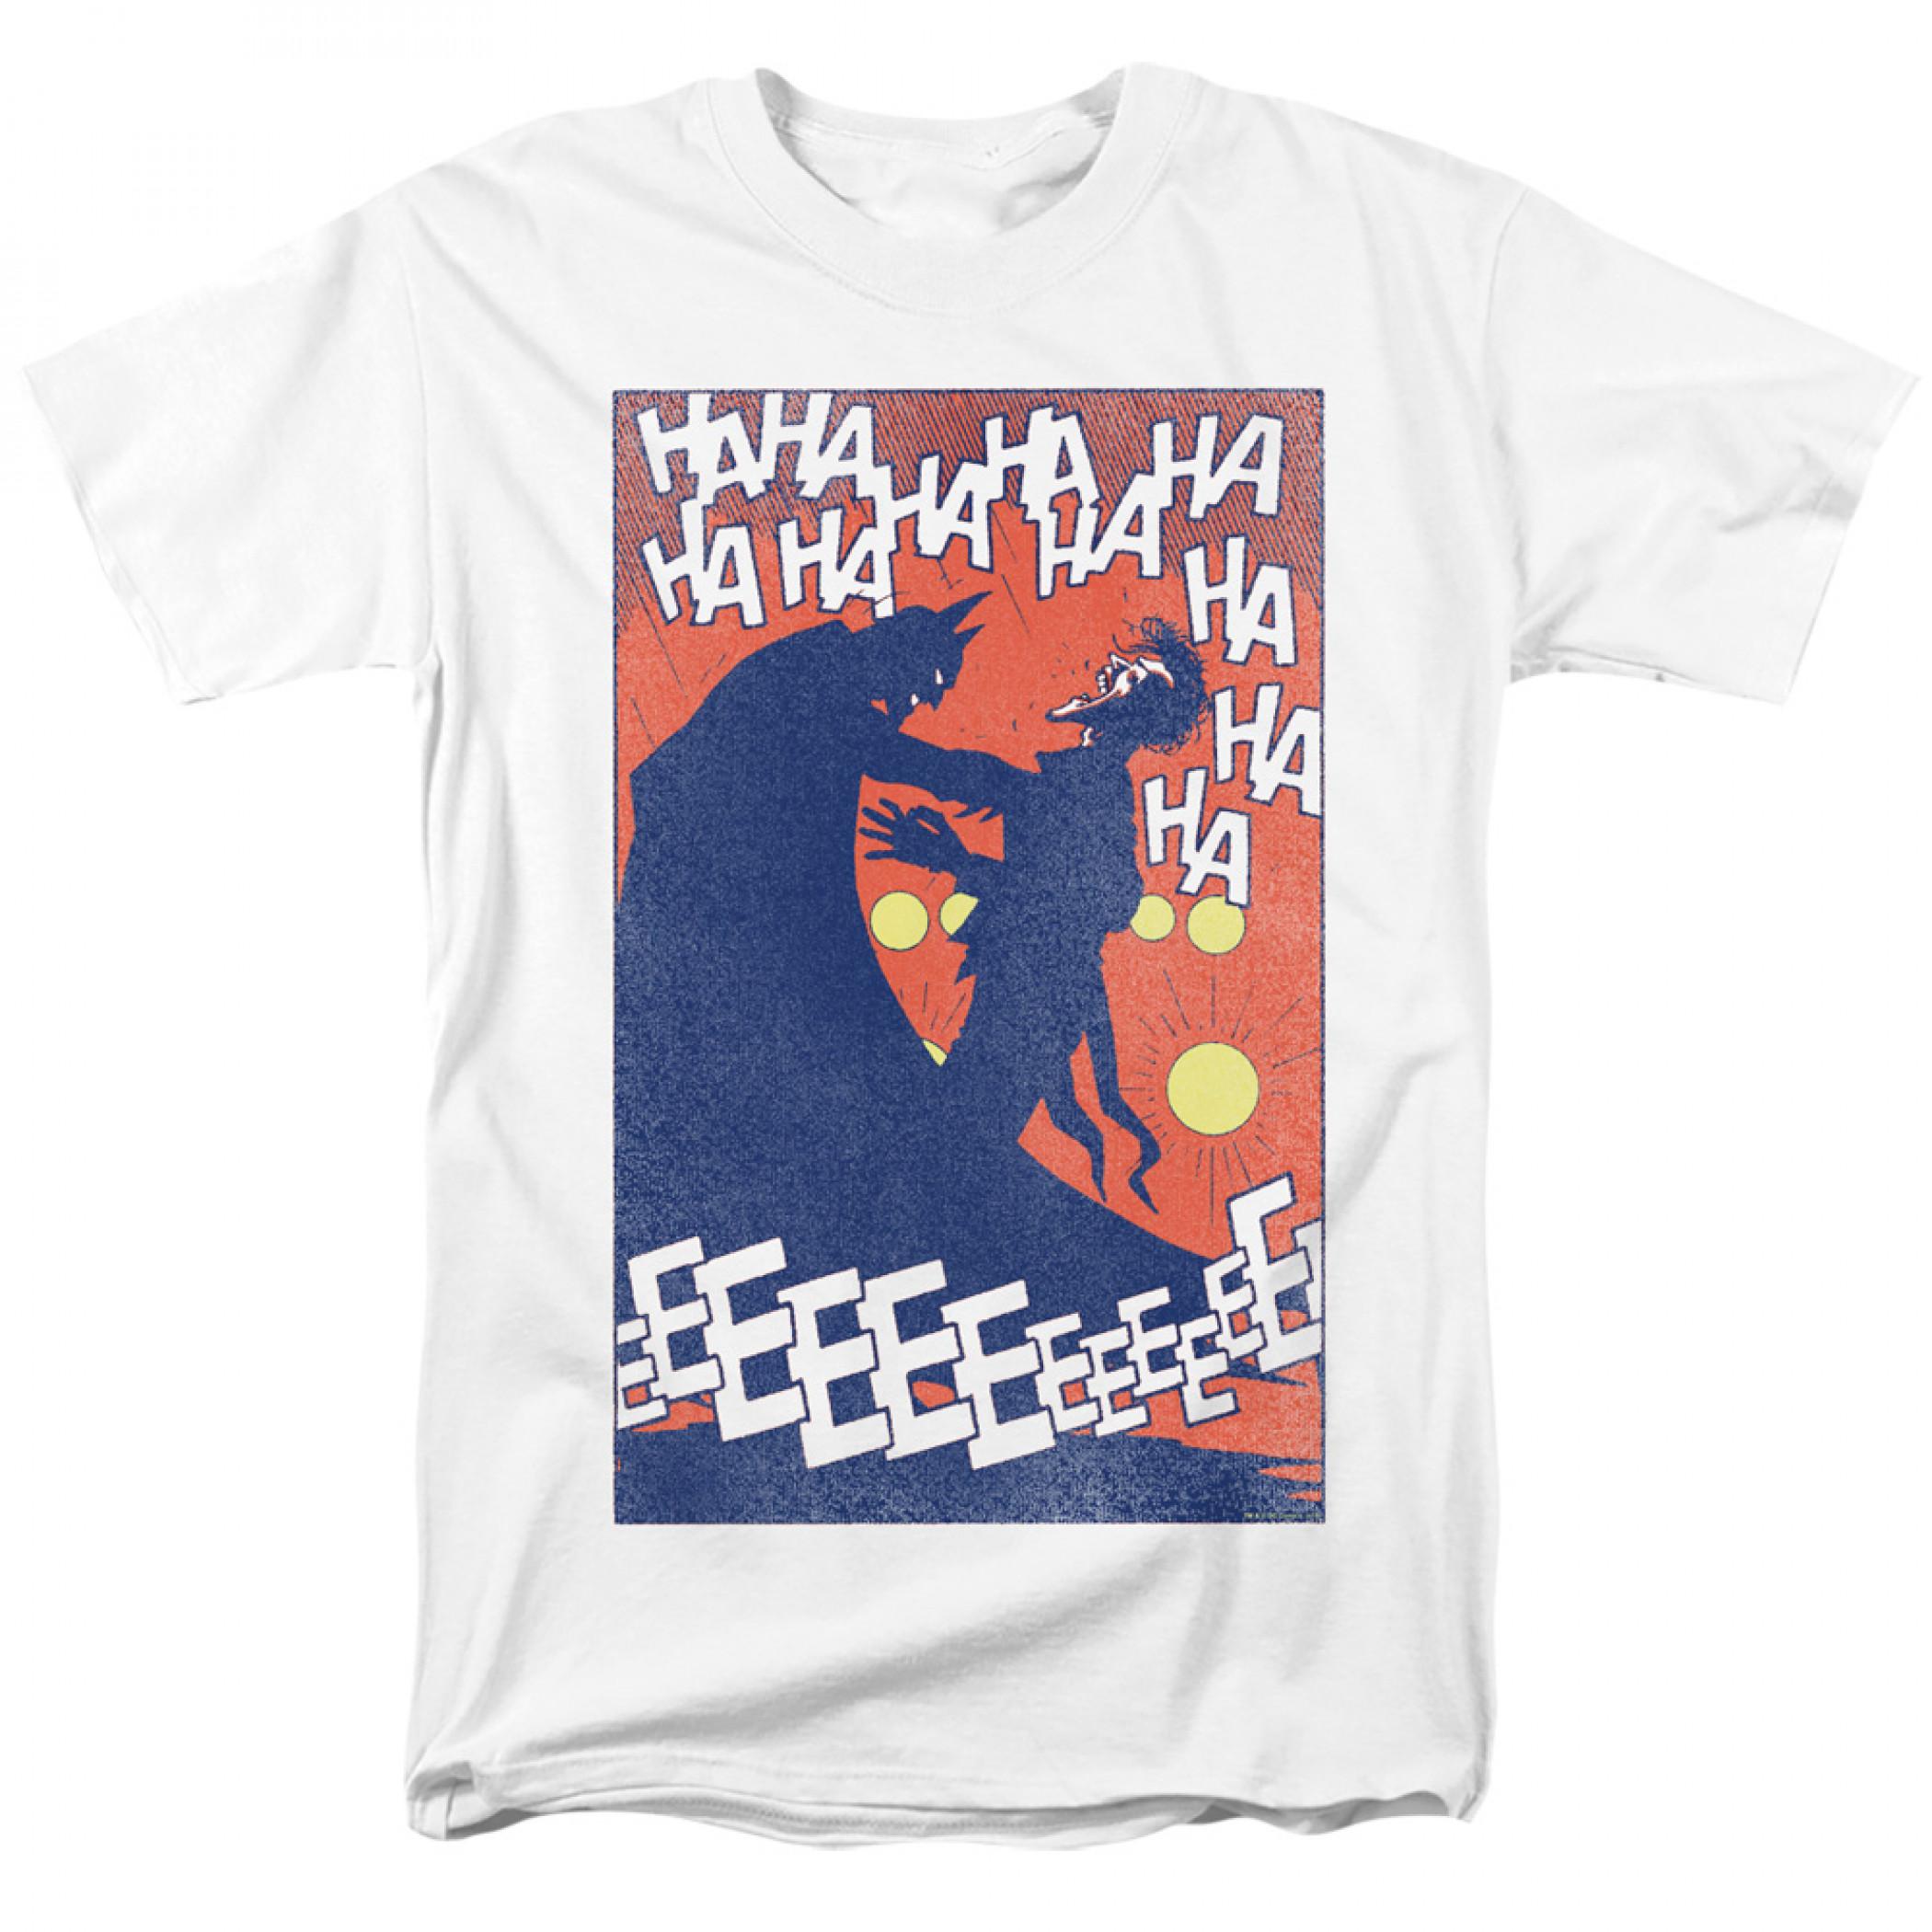 The Joker and Batman Punchline T-Shirt